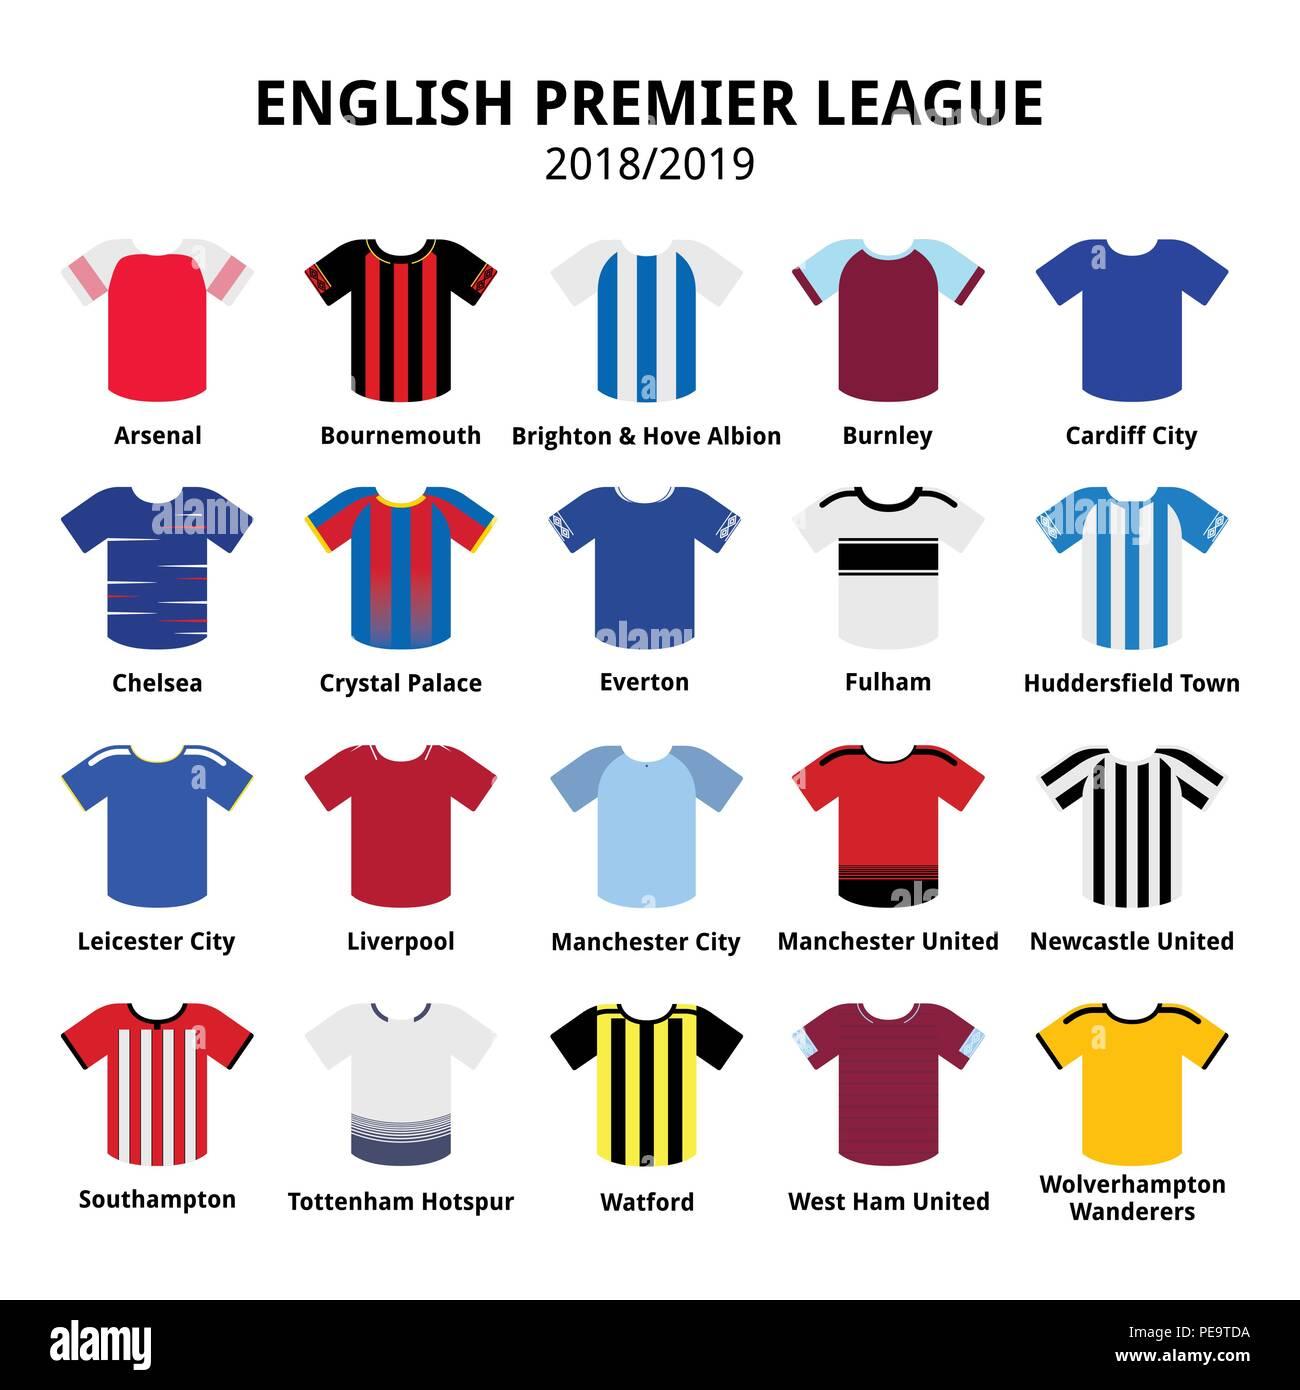 8856024f5 English Premier League kits 2018 - 2019, football or soccer jerseys icons  set from England 18/19 kits. Vector icons set of sport shirts - football lea